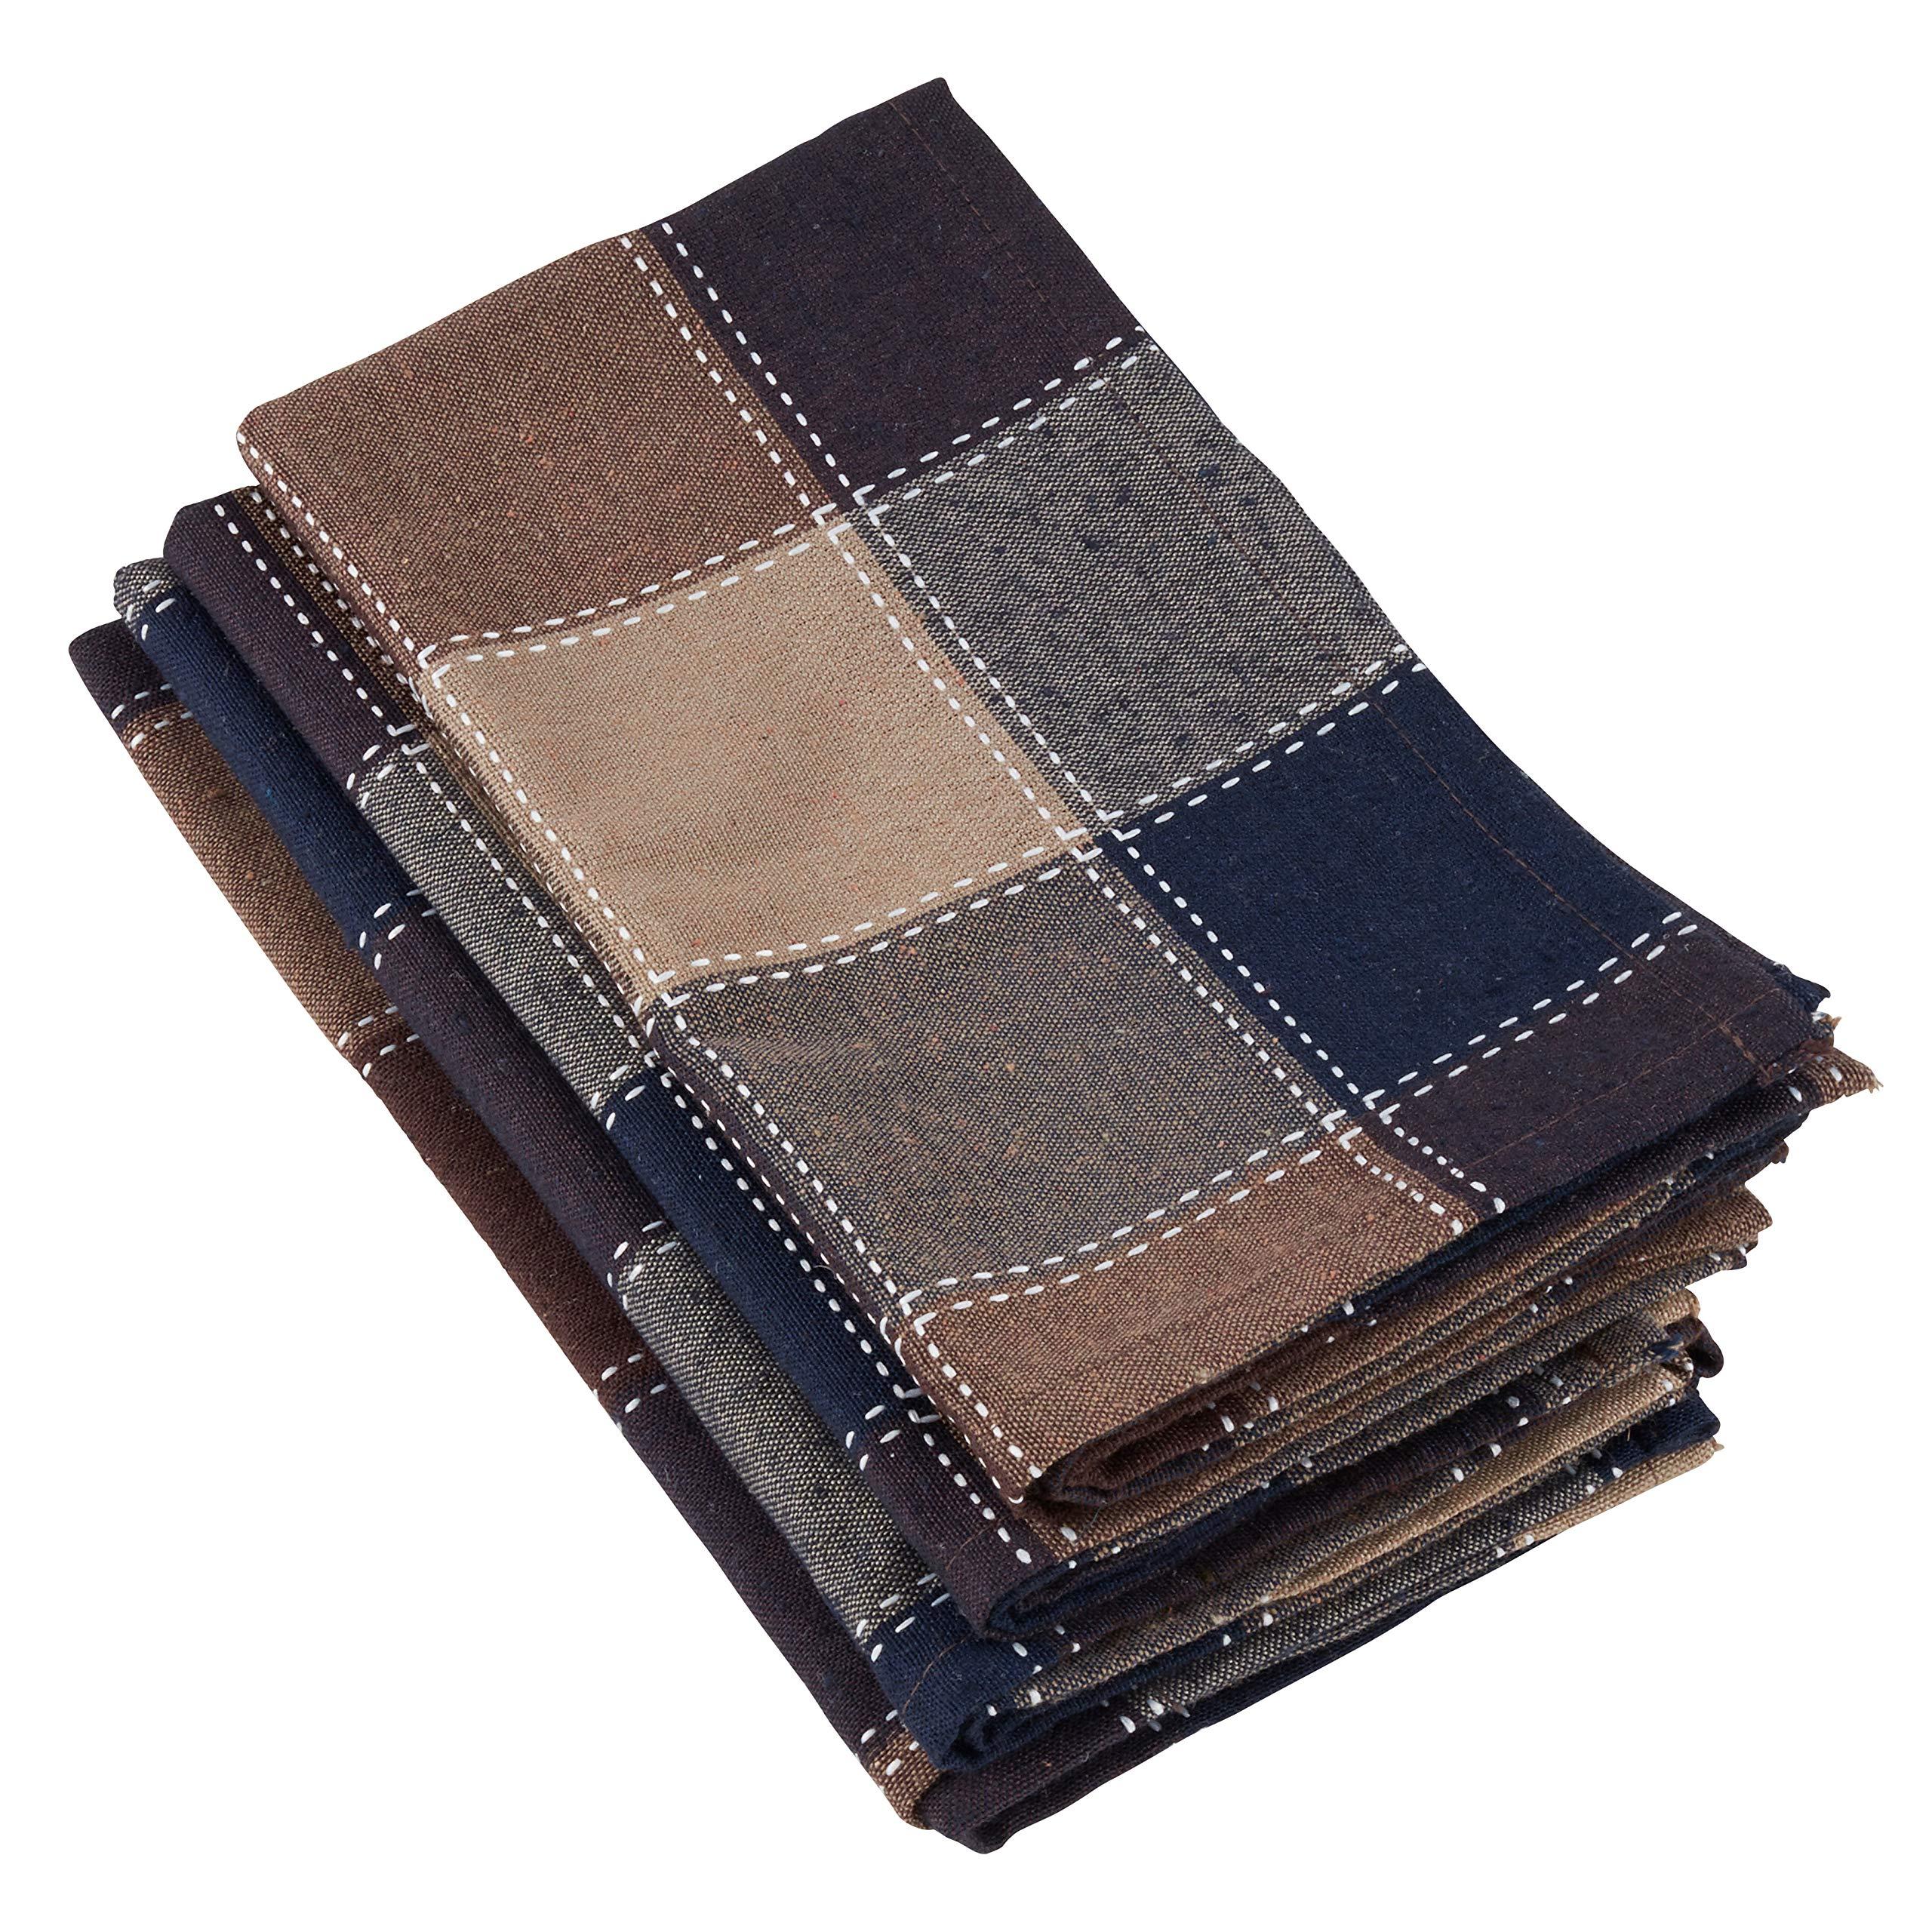 SARO LIFESTYLE 8571.BR20S Harvest Collection Stitched Plaid Design Cotton Blend Napkins (Set of 4), 20'', Brown